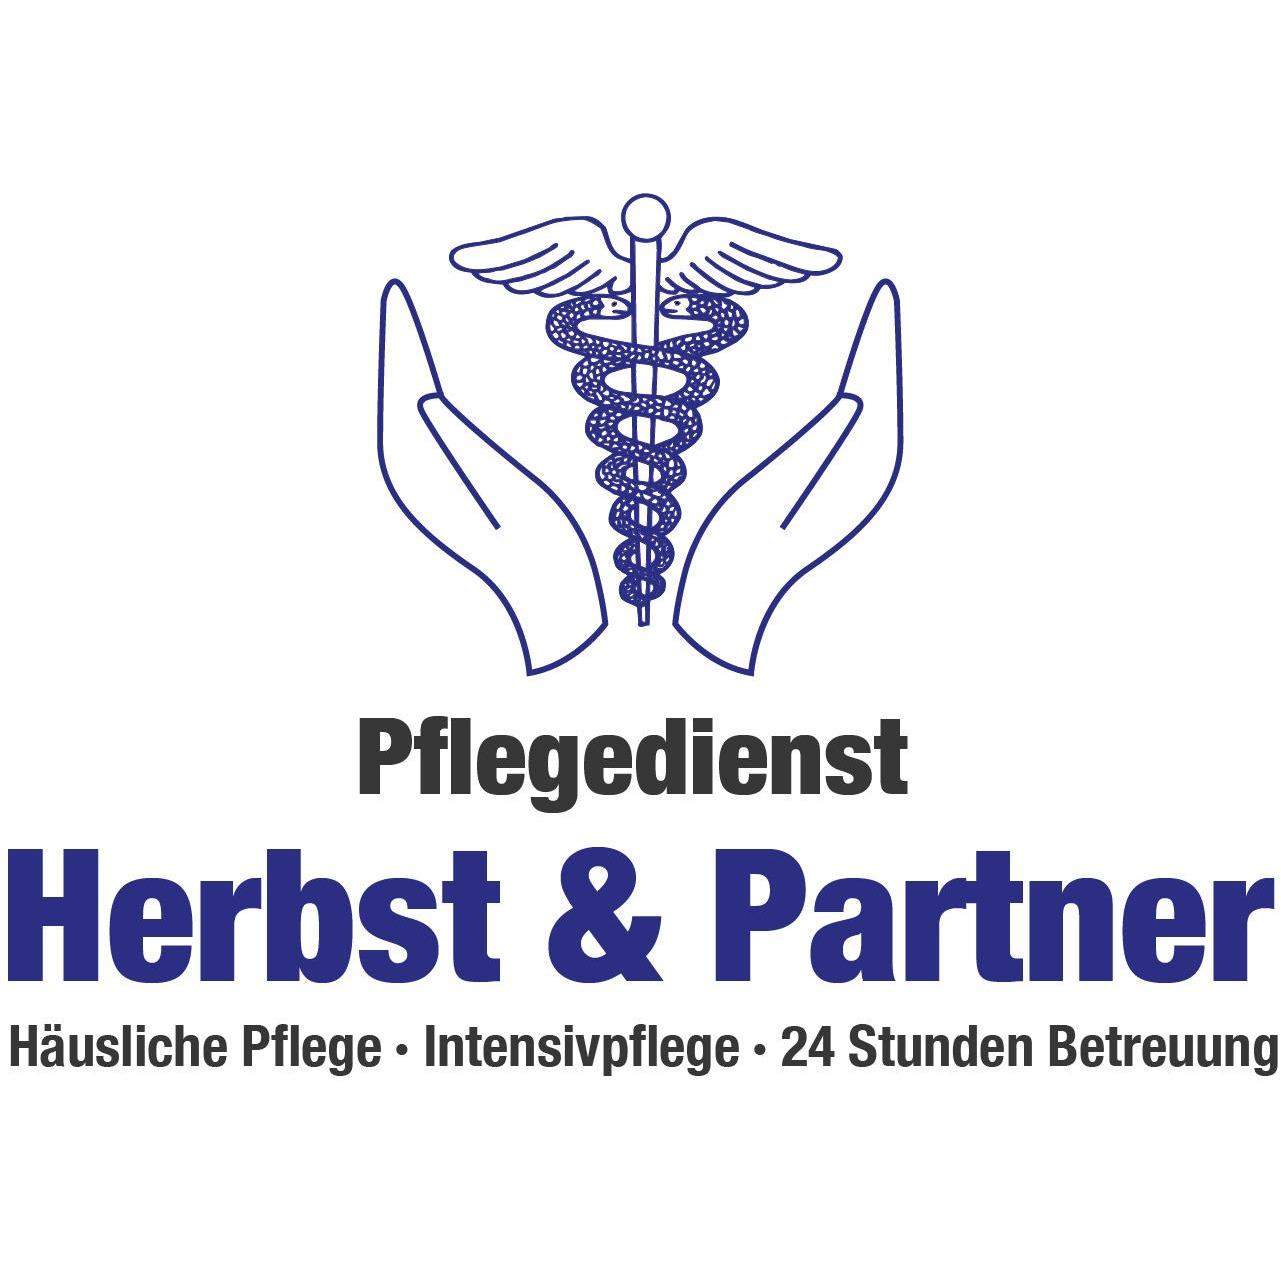 Pflegedienst Herbst & Partner Wachtberg